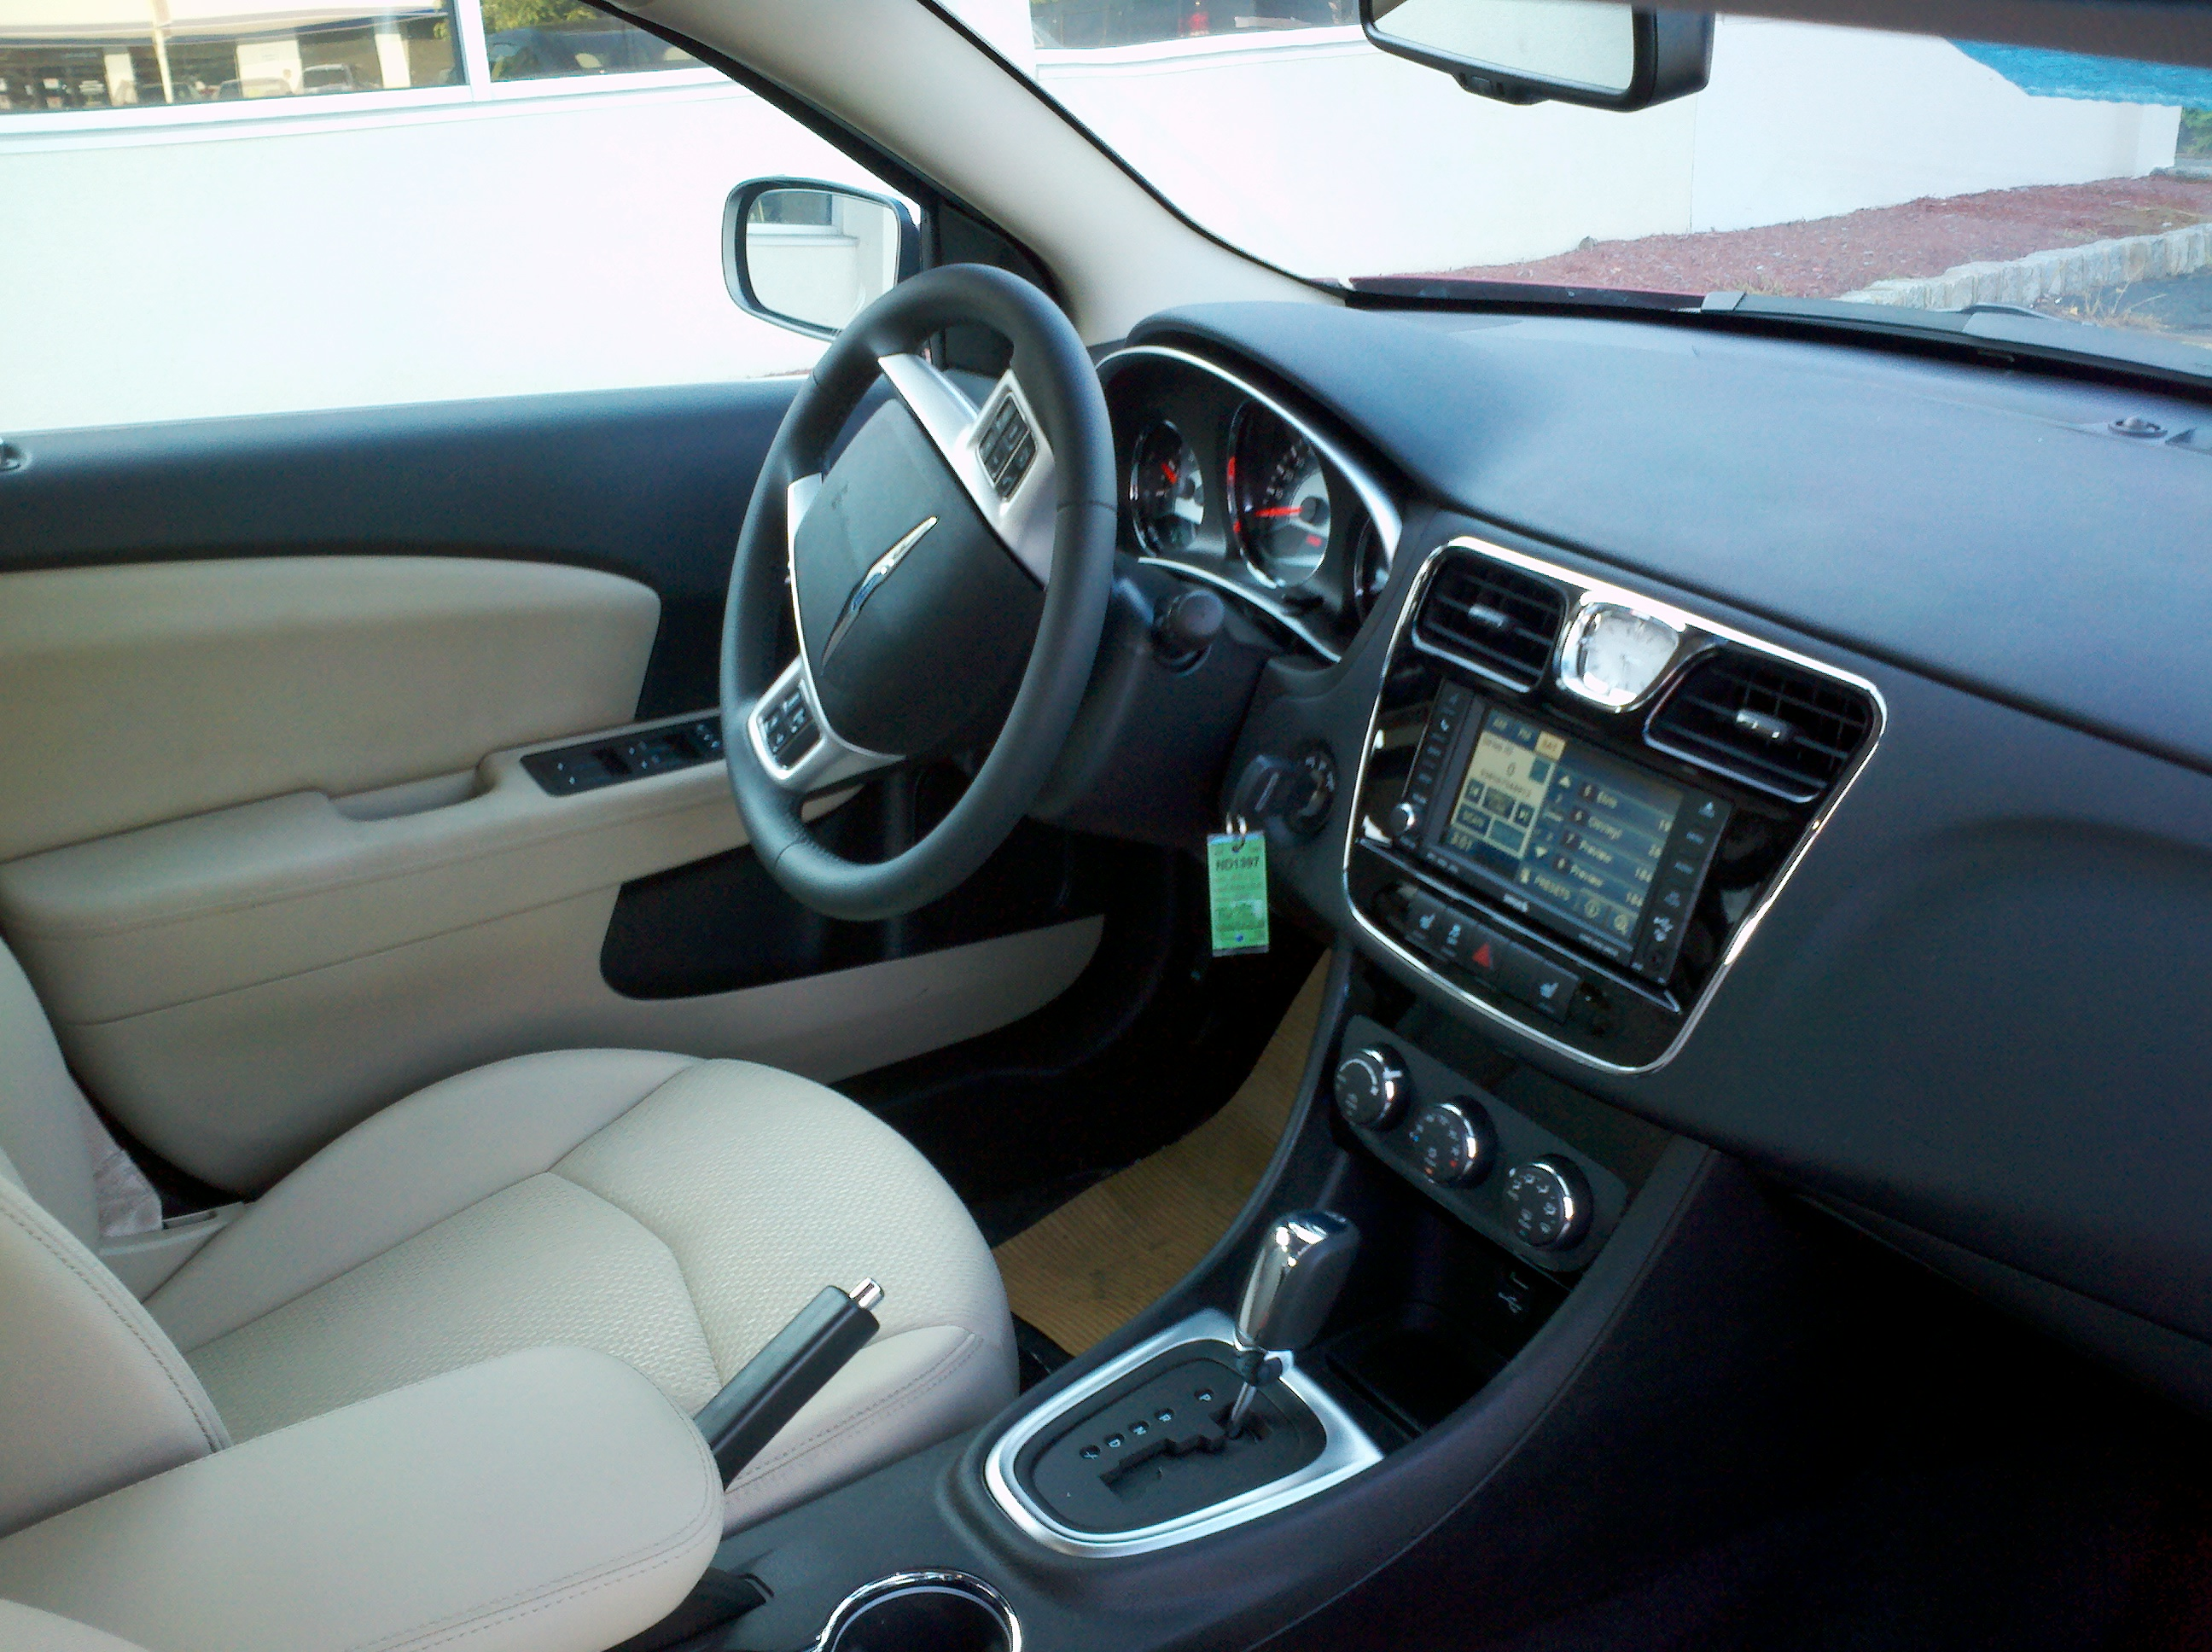 Test Driven Chrysler 200 Mind Over Motor